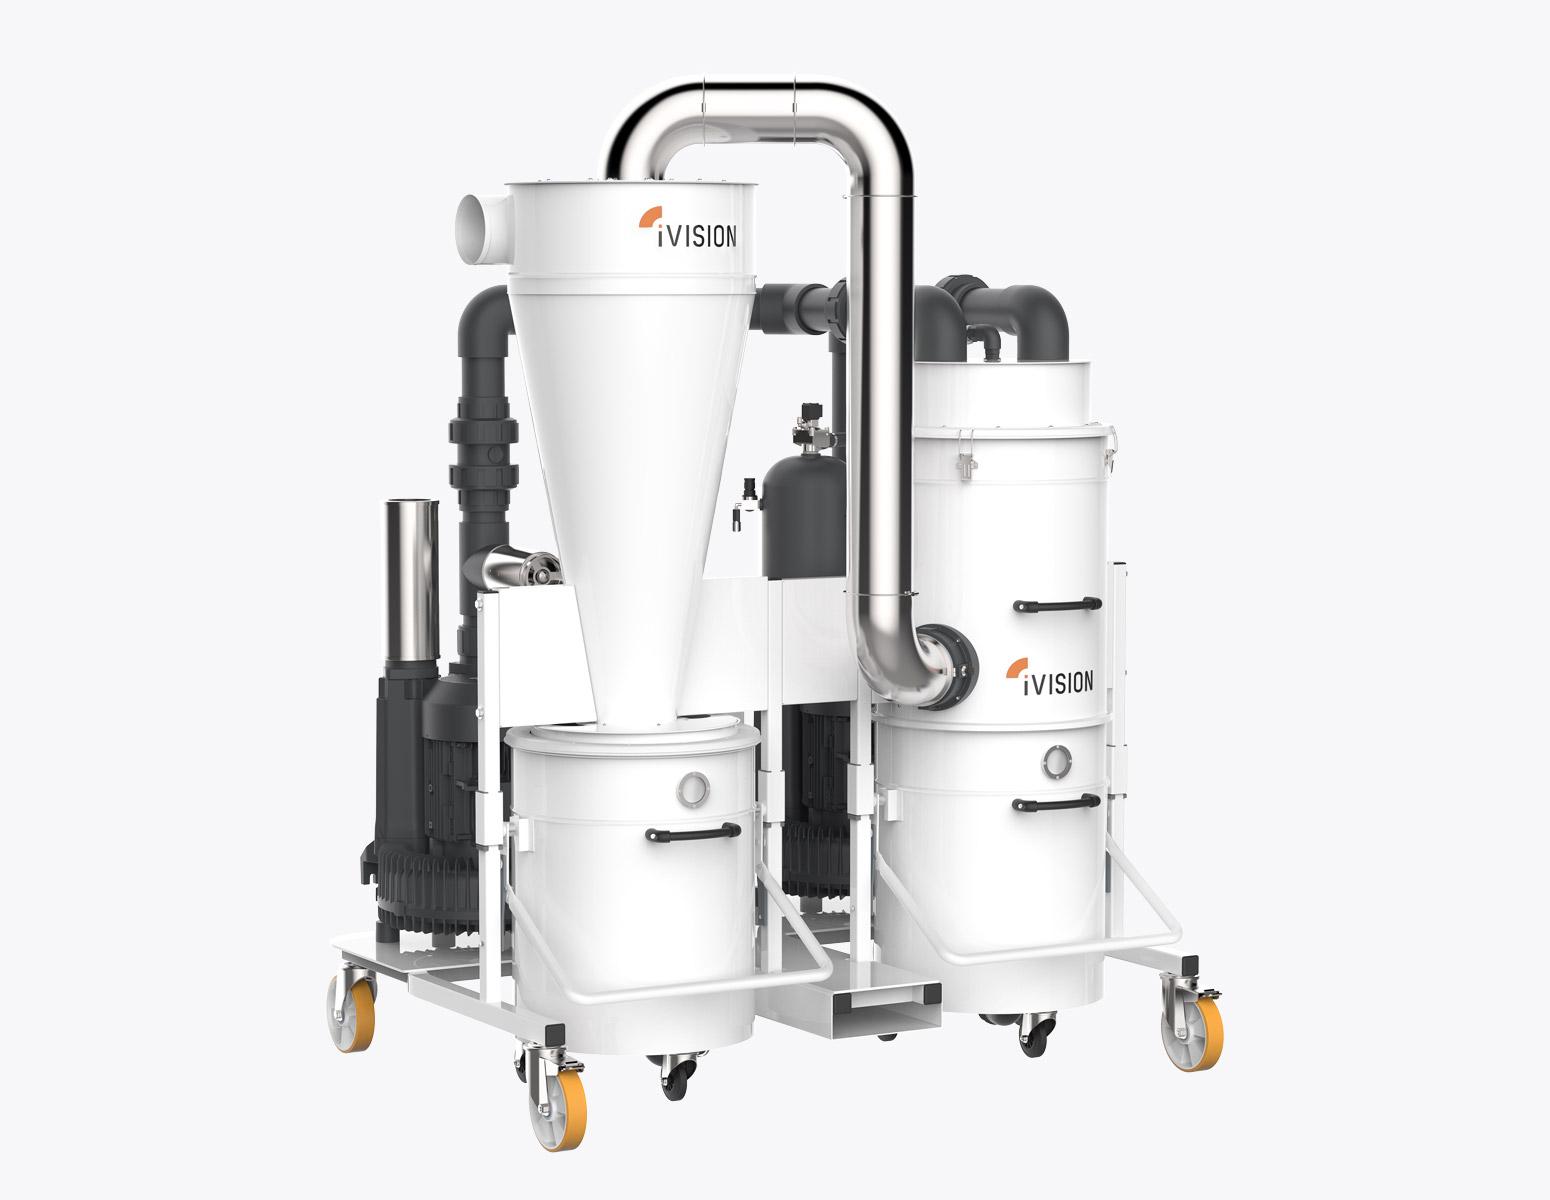 IV CUSTOM PCB-Industrial Vacuum Cleaner for Fiberglass and